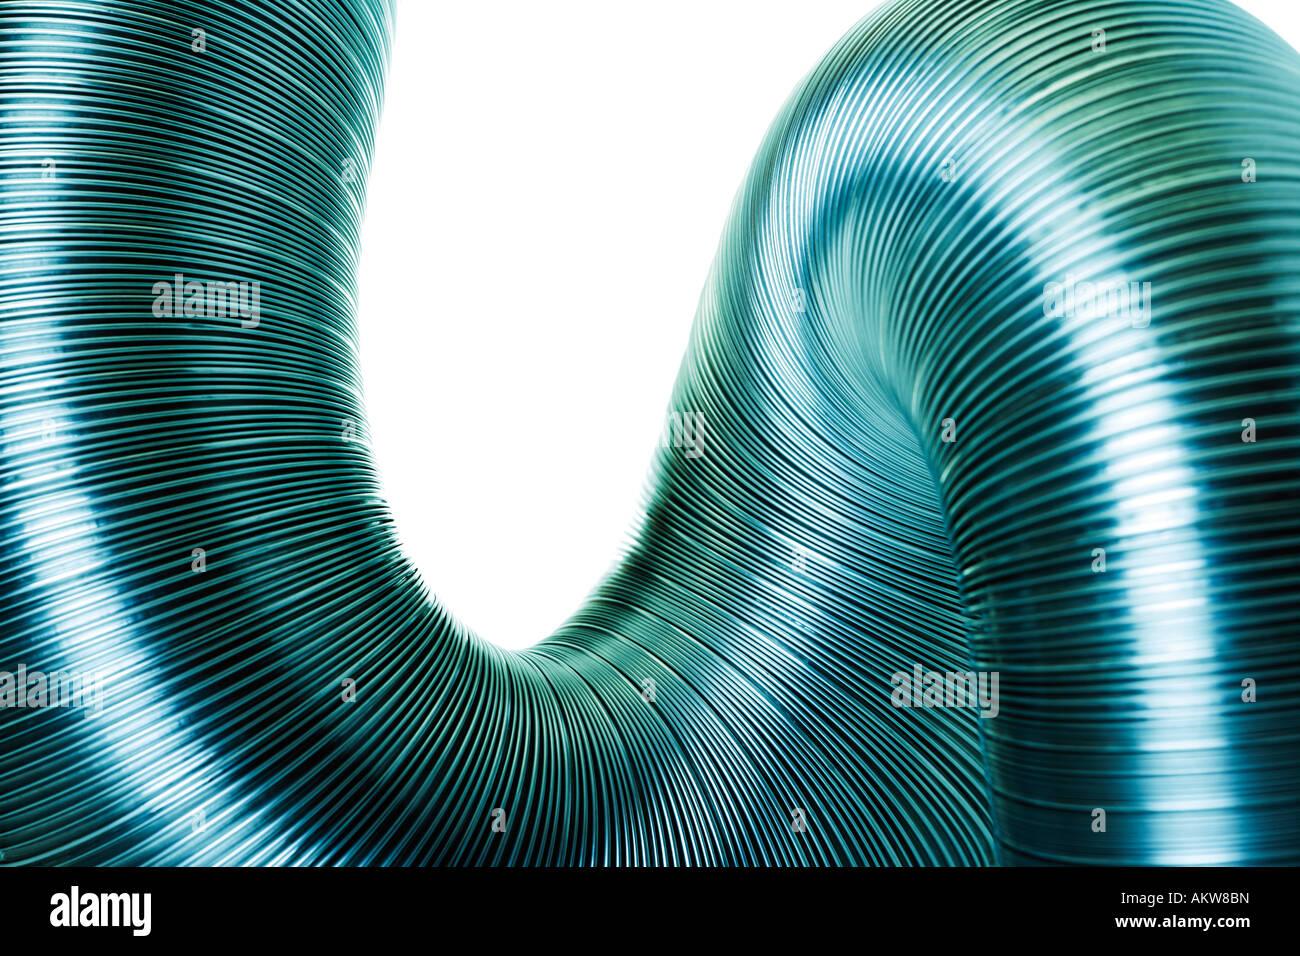 Tubo de aluminio, close-up Imagen De Stock